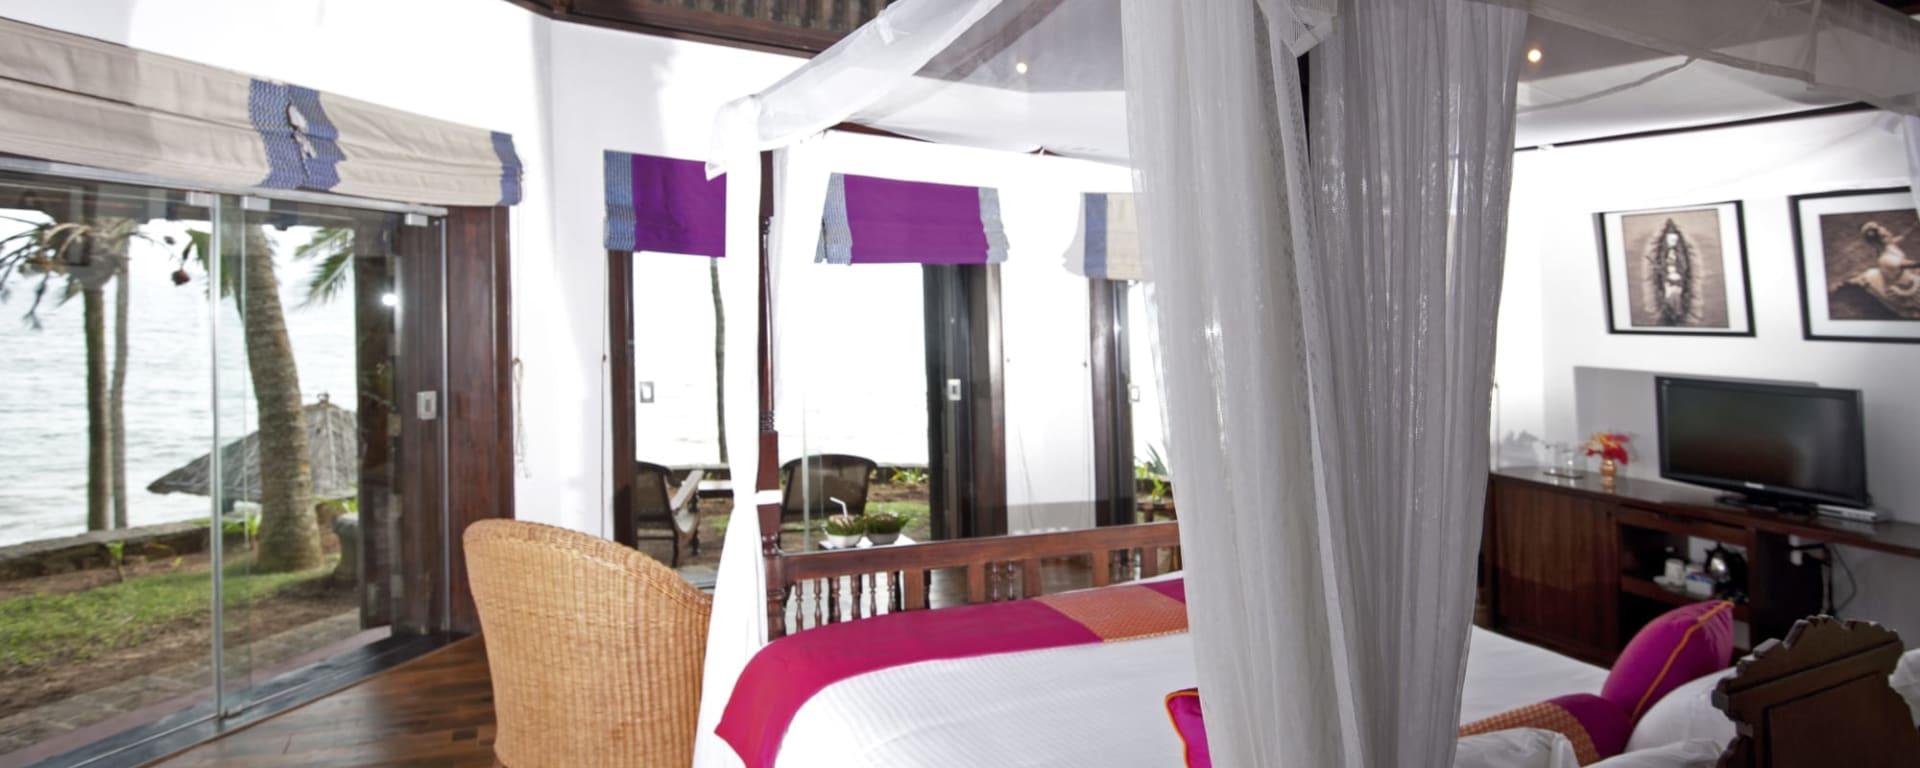 Niraamaya Retreats Surya Samudra in Kerala | Malabarküste | Kochi: Niraamaya Retreats Surya Samudra Rock Garten Zimmer